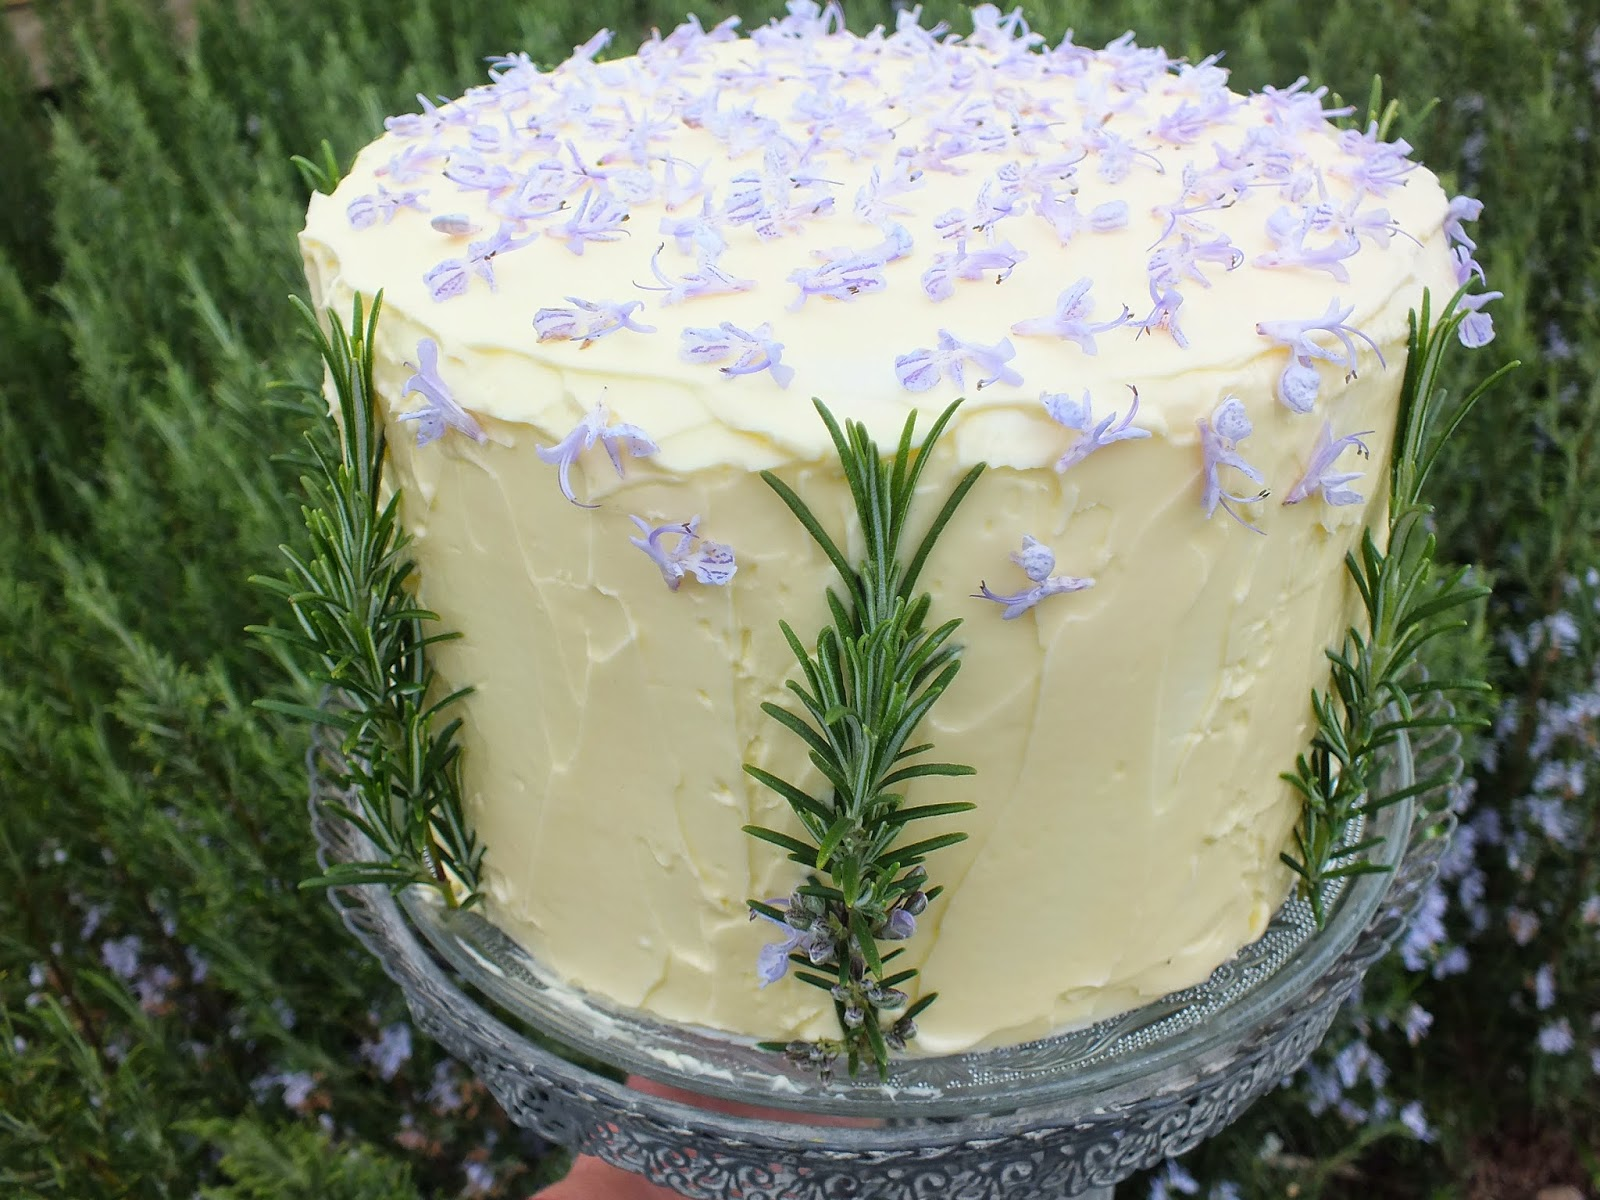 Edible flowers: Rosemary Cake